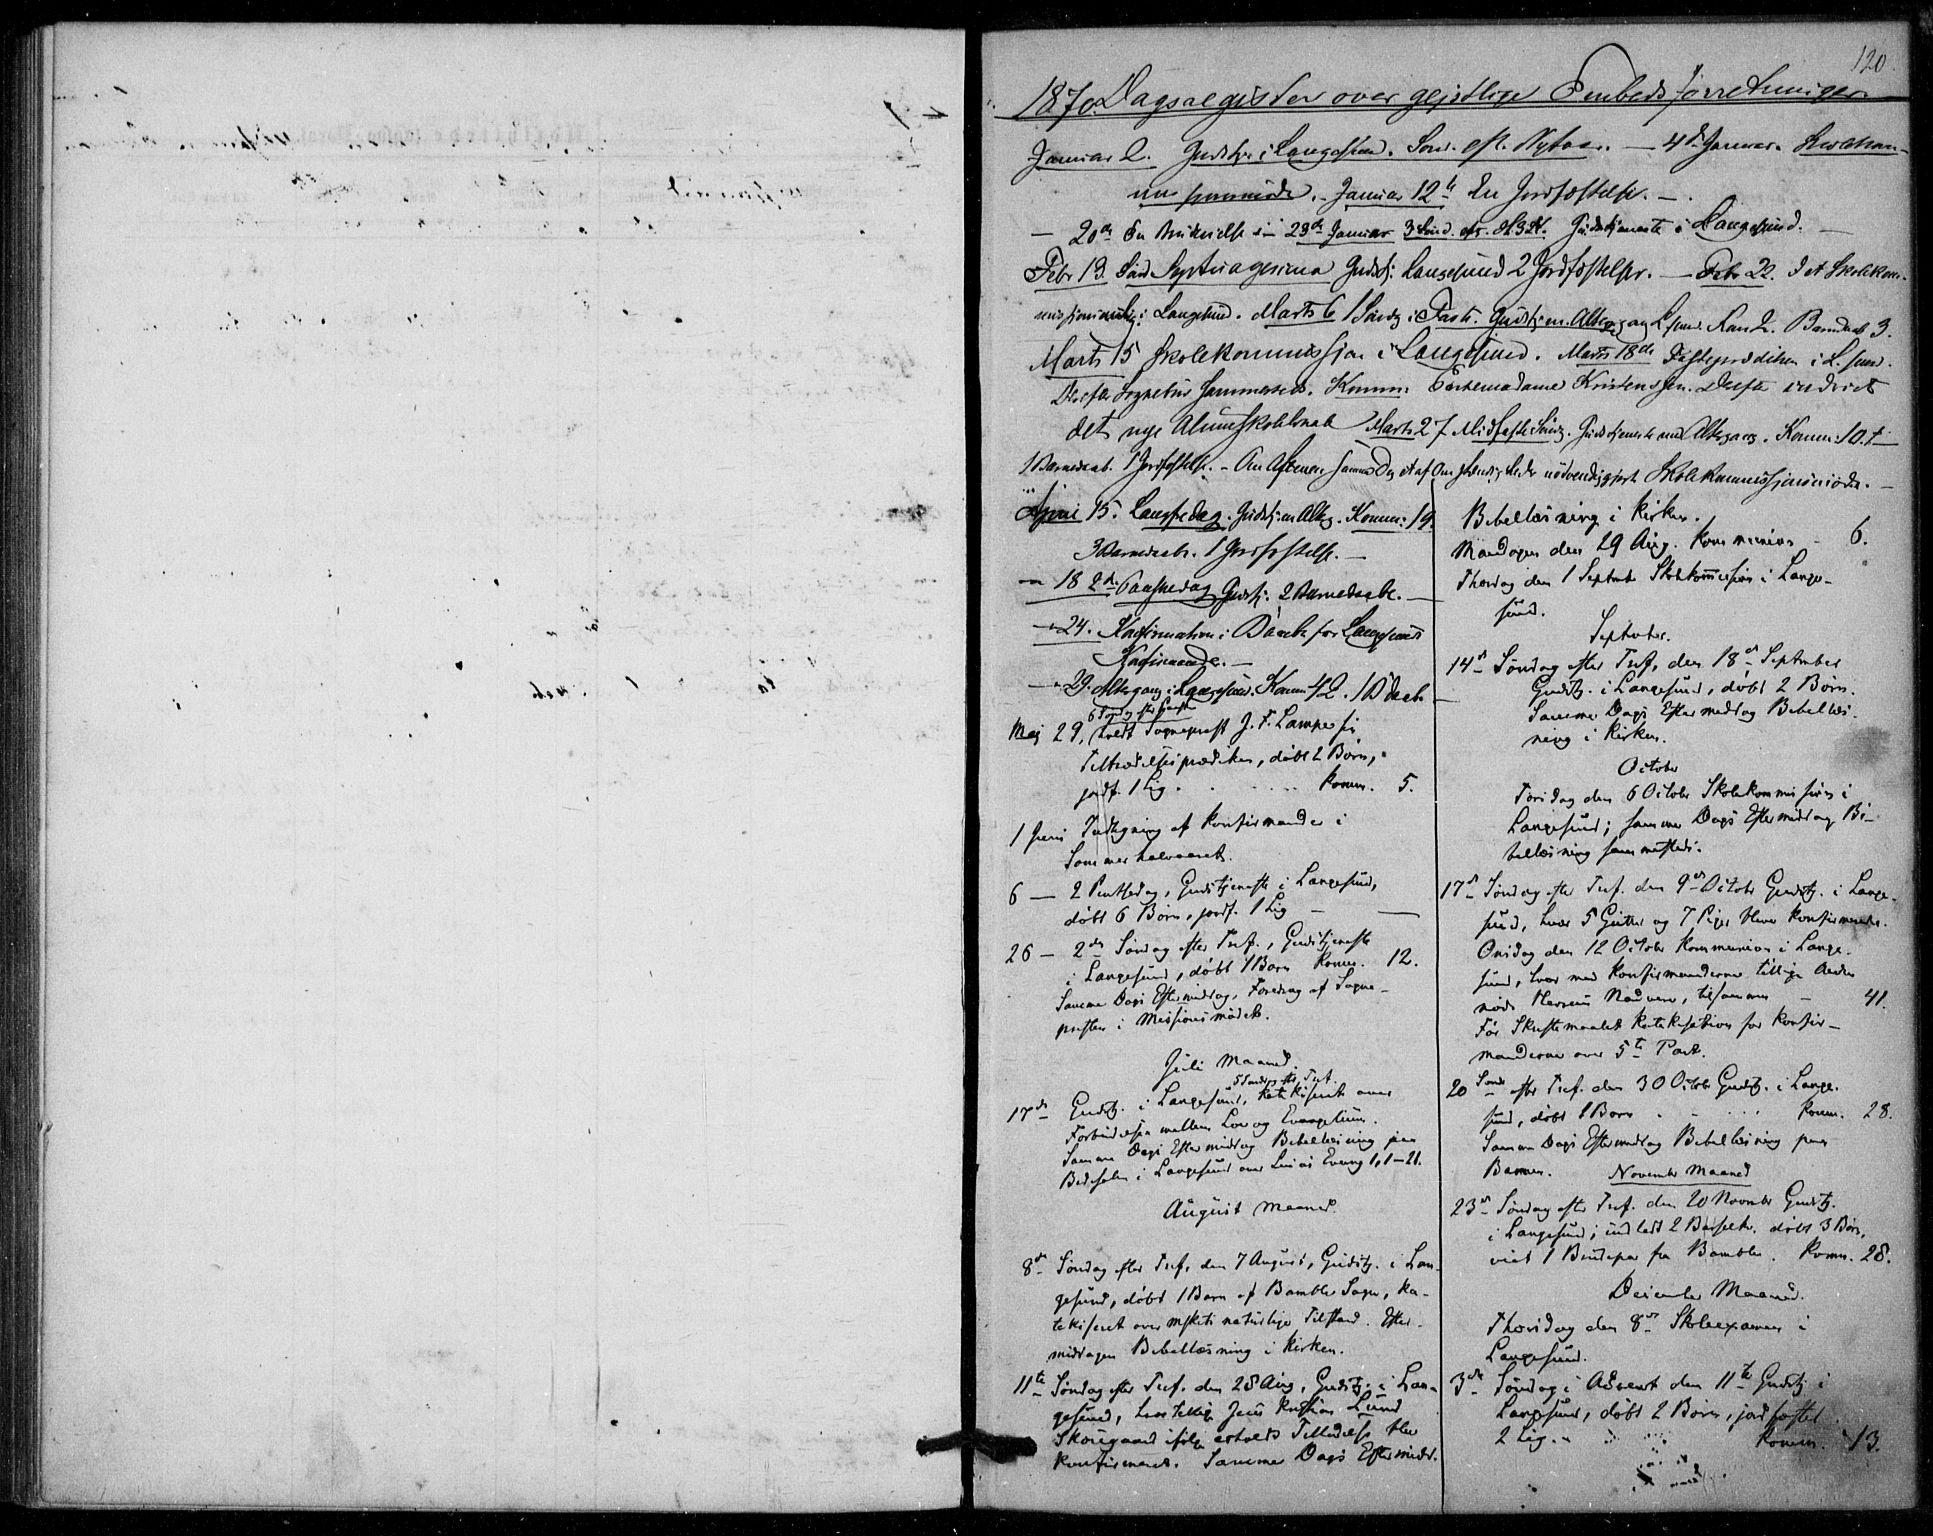 SAKO, Langesund kirkebøker, F/Fa/L0001: Ministerialbok nr. 1, 1870-1877, s. 120